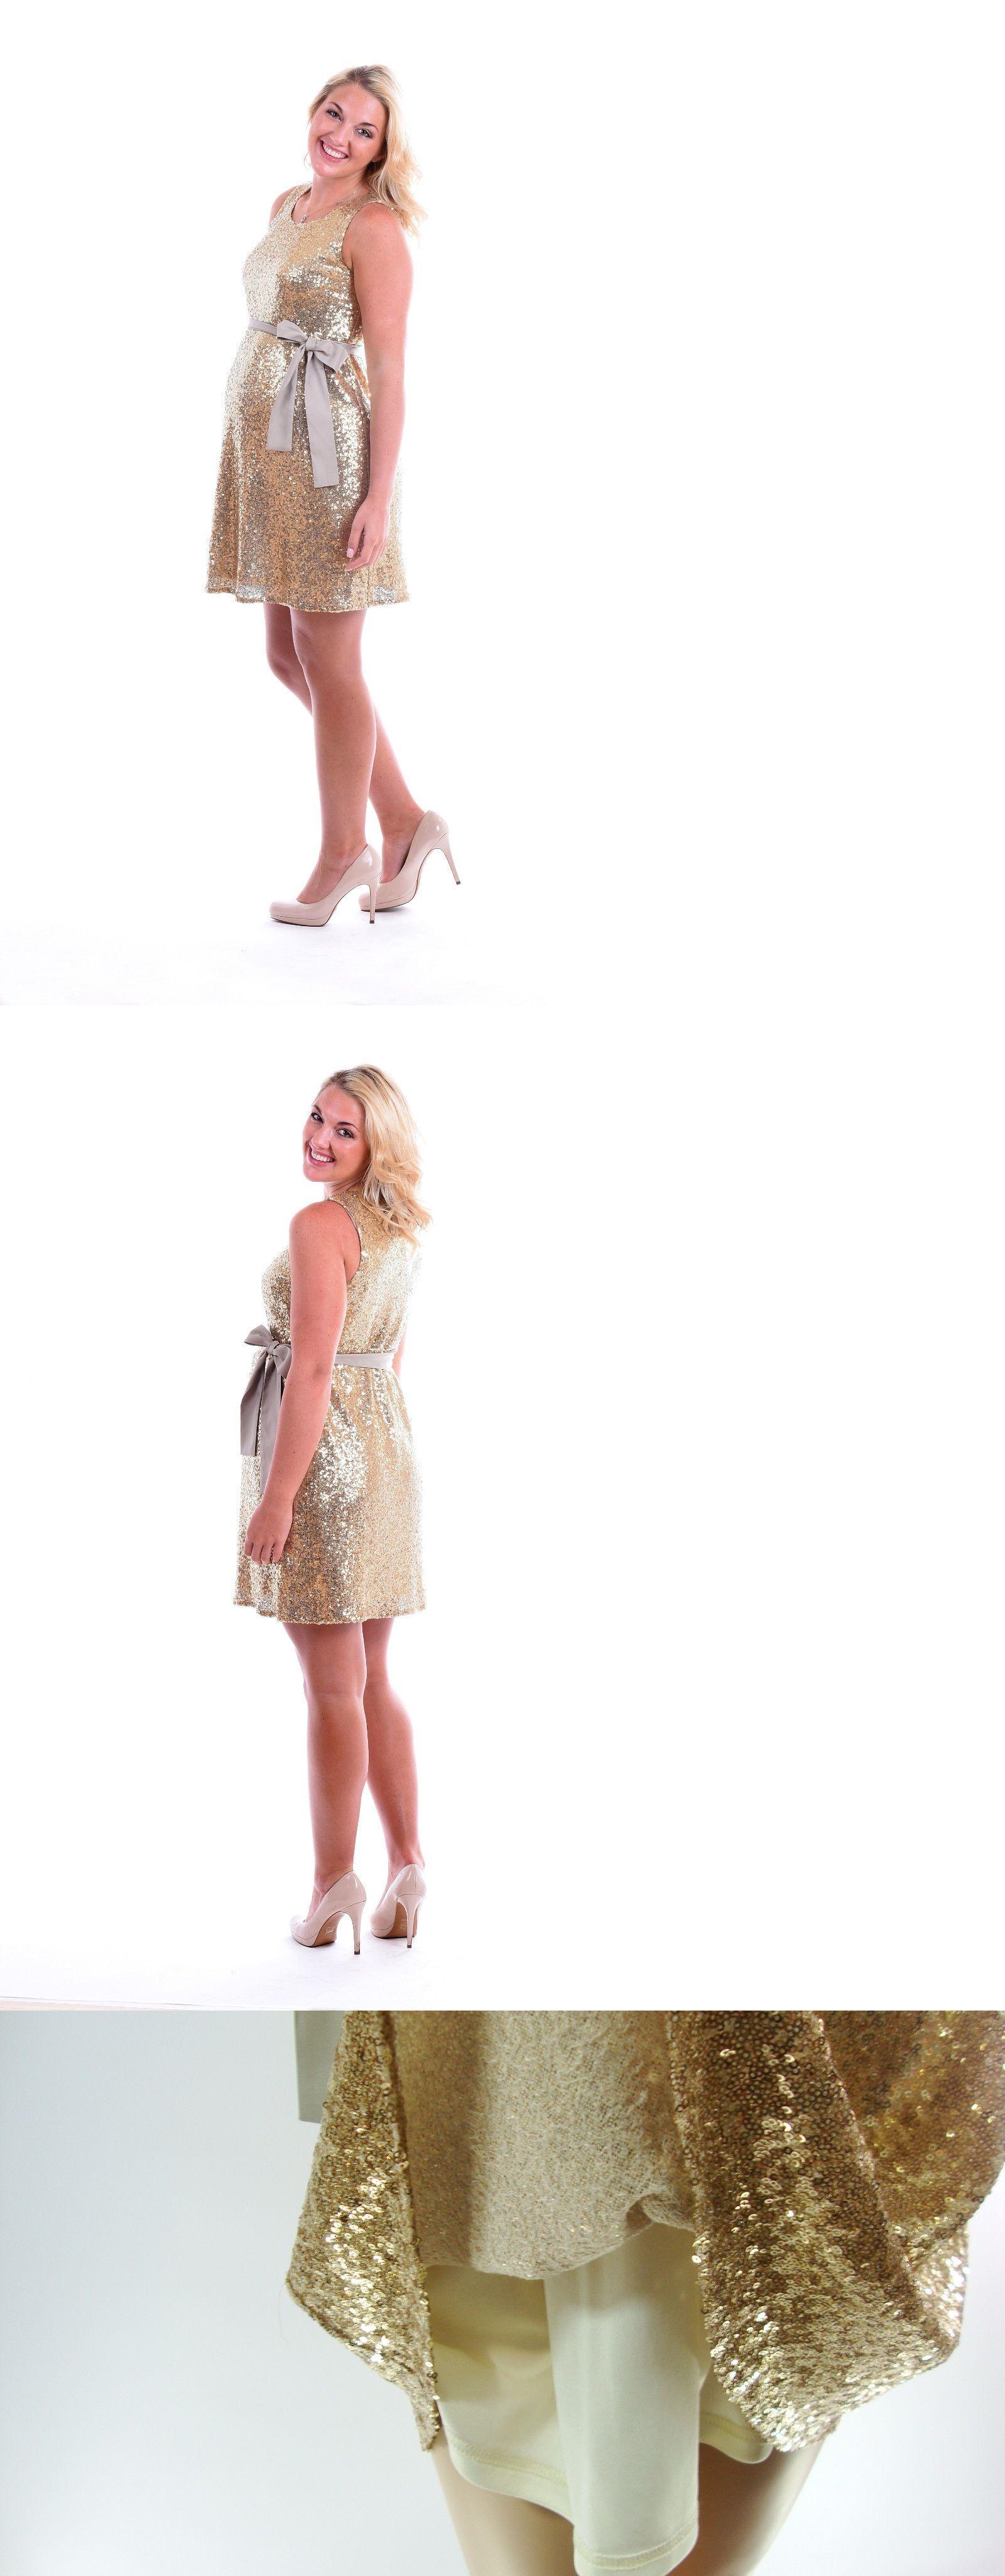 Dresses 11534 gold sleeveless sequin sexy babyshower maternity dresses 11534 gold sleeveless sequin sexy babyshower maternity dress sml ombrellifo Image collections